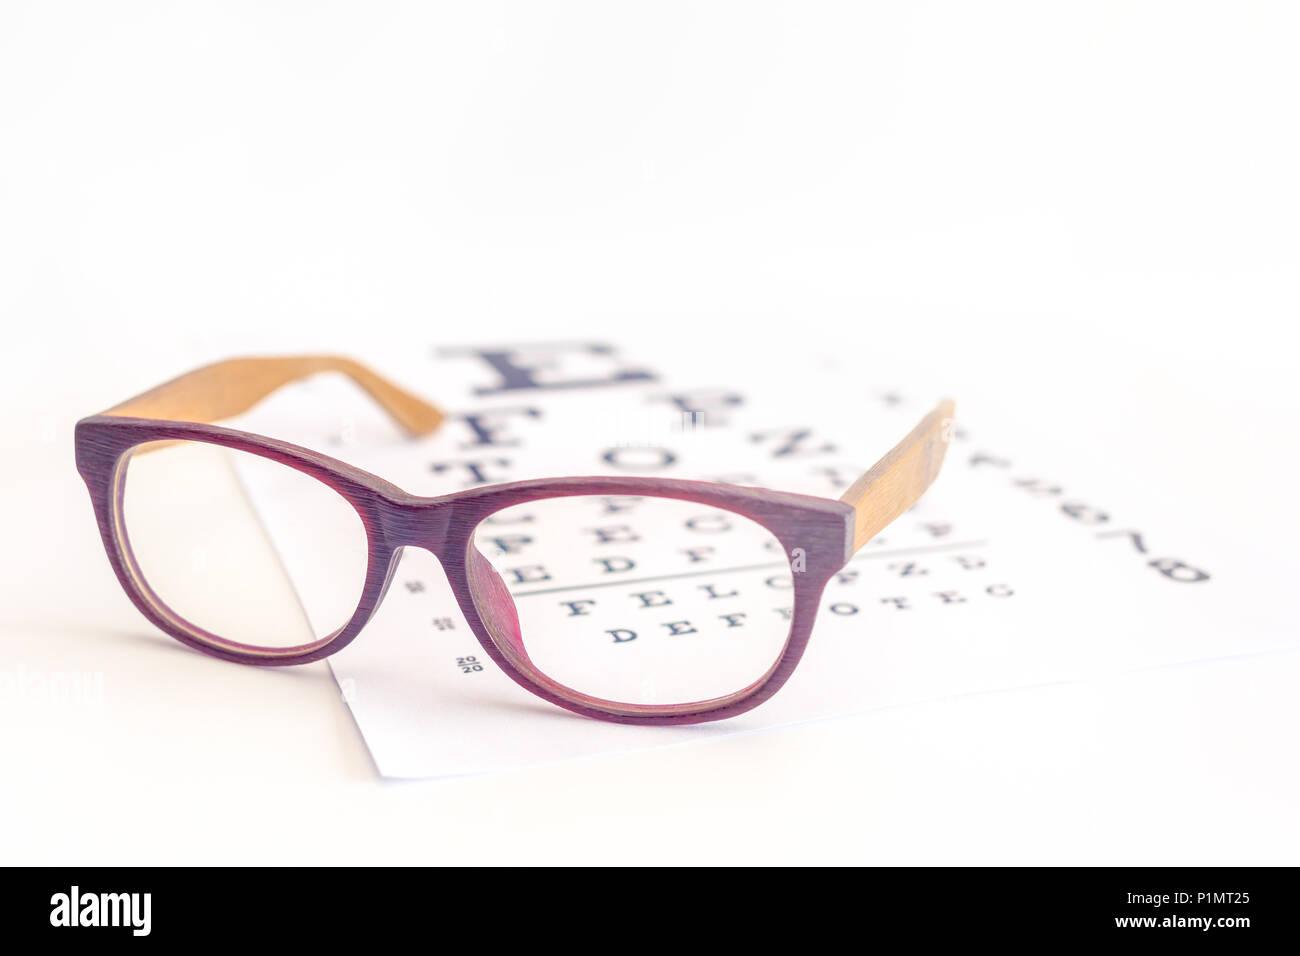 909031ee415 Eye Chart Blurred Stock Photos   Eye Chart Blurred Stock Images - Alamy